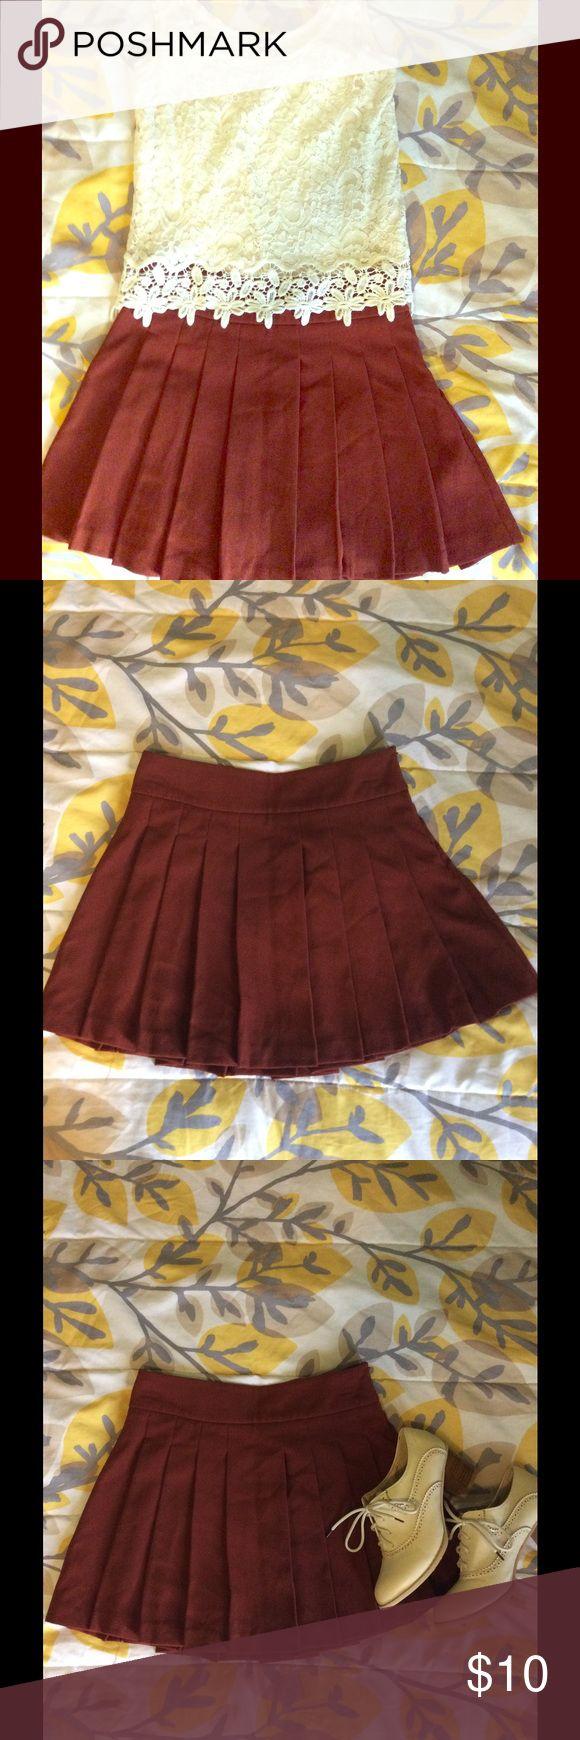 Forever 21 Rust Colored Mini Skirt Lightly worn, schoolgirl style rust/maroon colored mini skirt. Forever 21 Skirts Mini